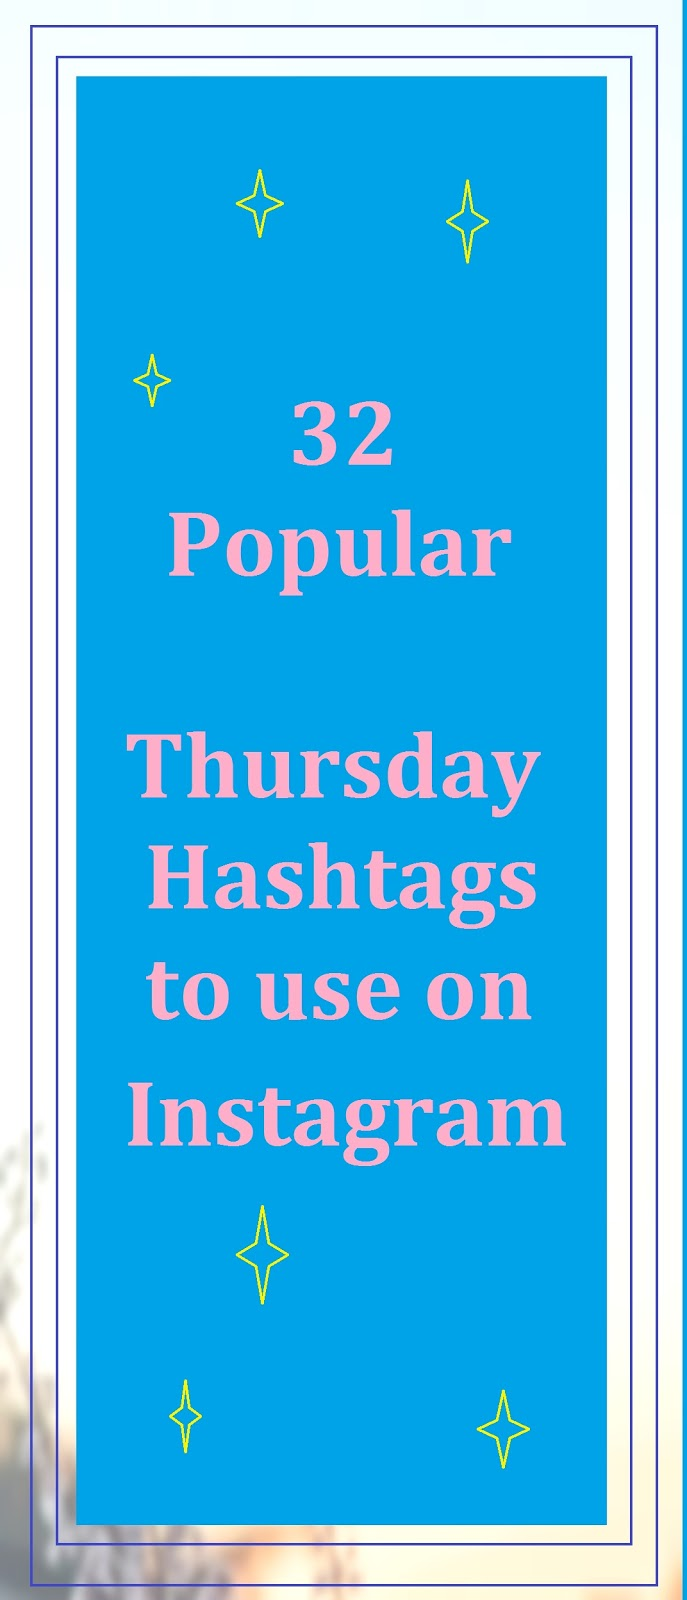 34 Popular Thursday Hashtags To Use On Instagram